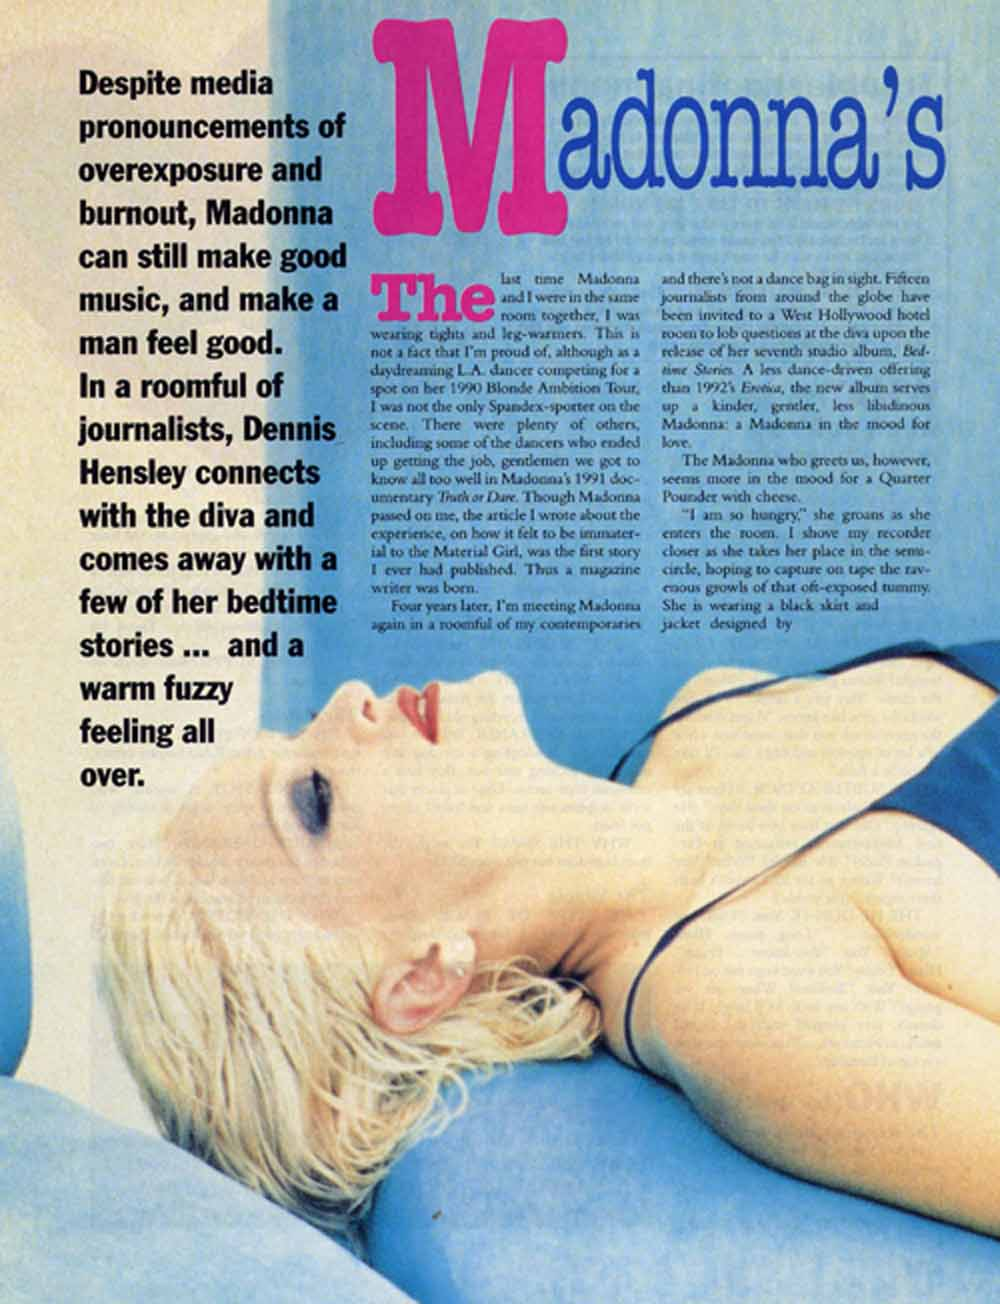 MadonnaCleo1.jpg